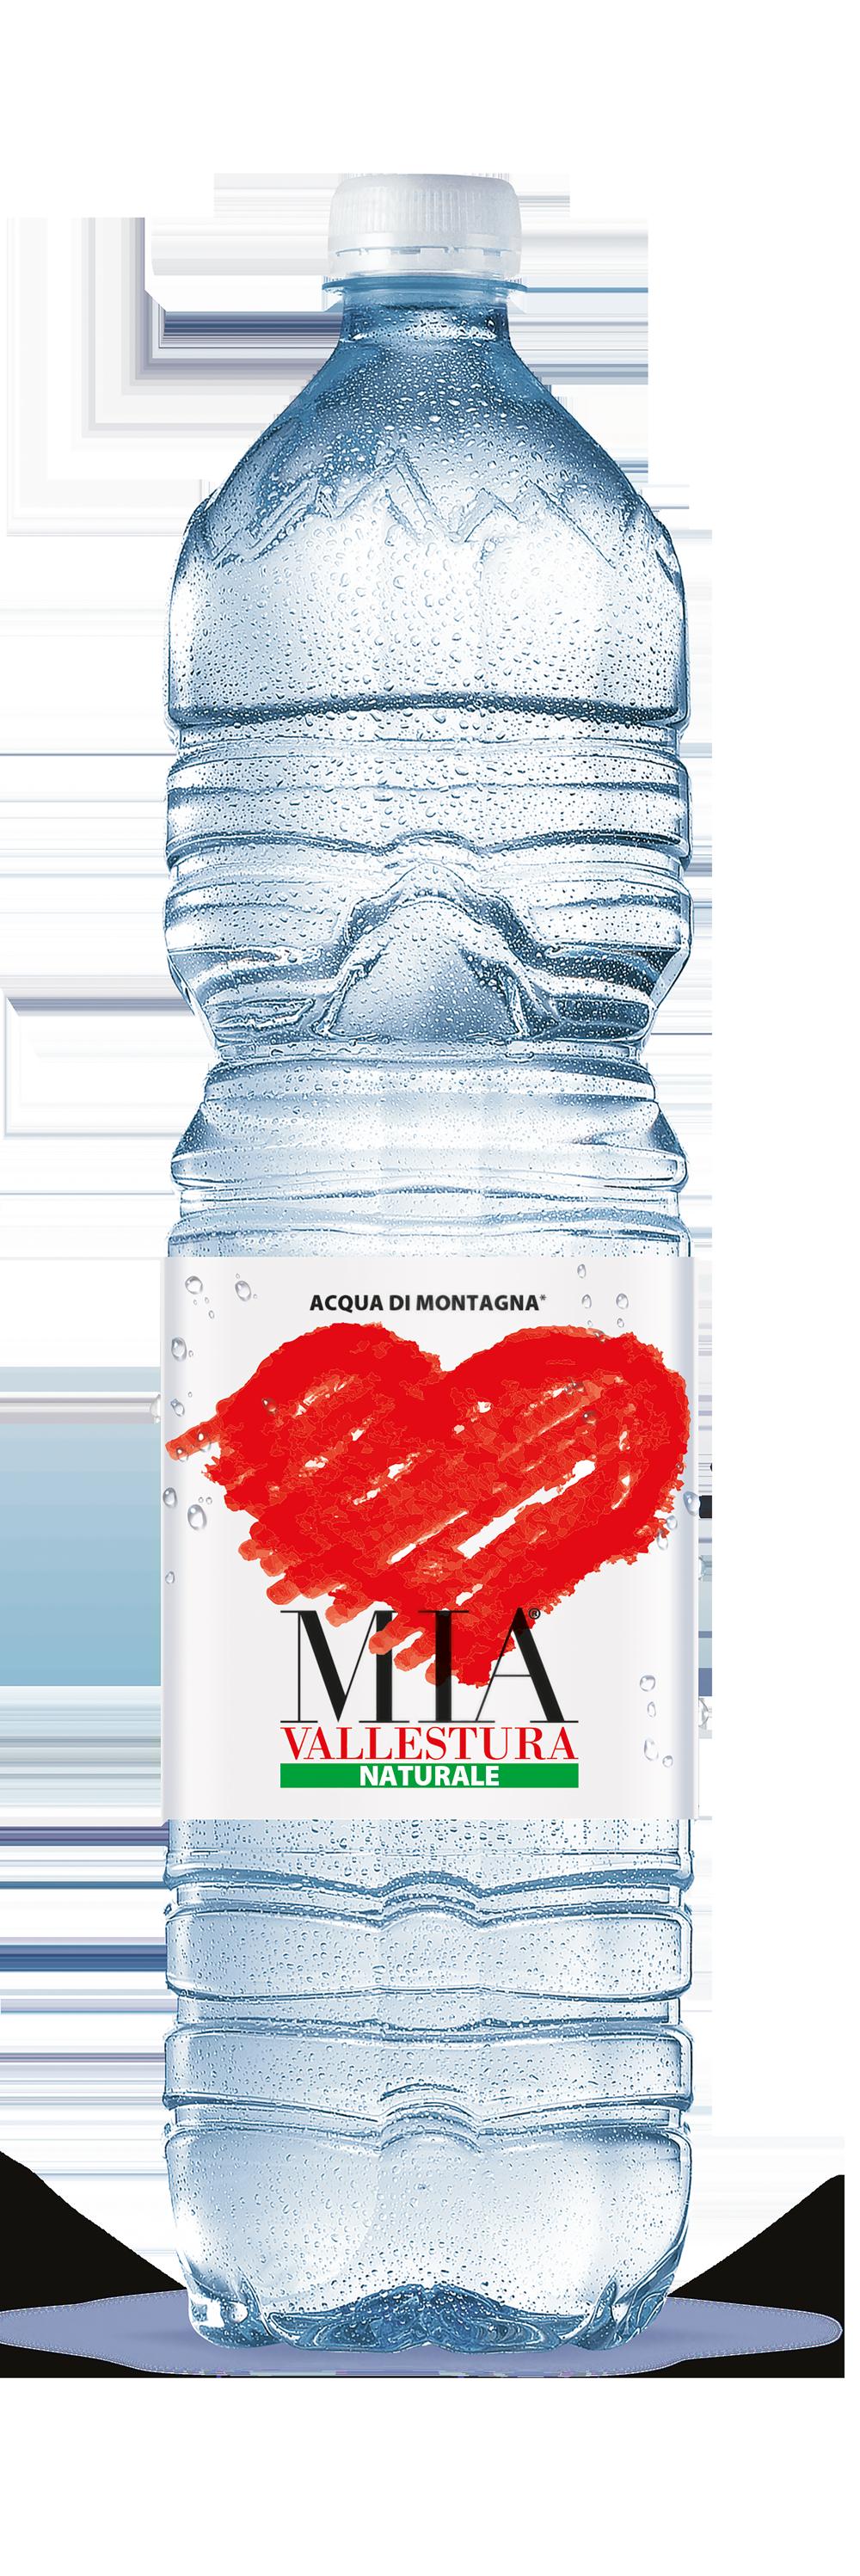 Acqua Mia Vallestura - Naturale 1,5l